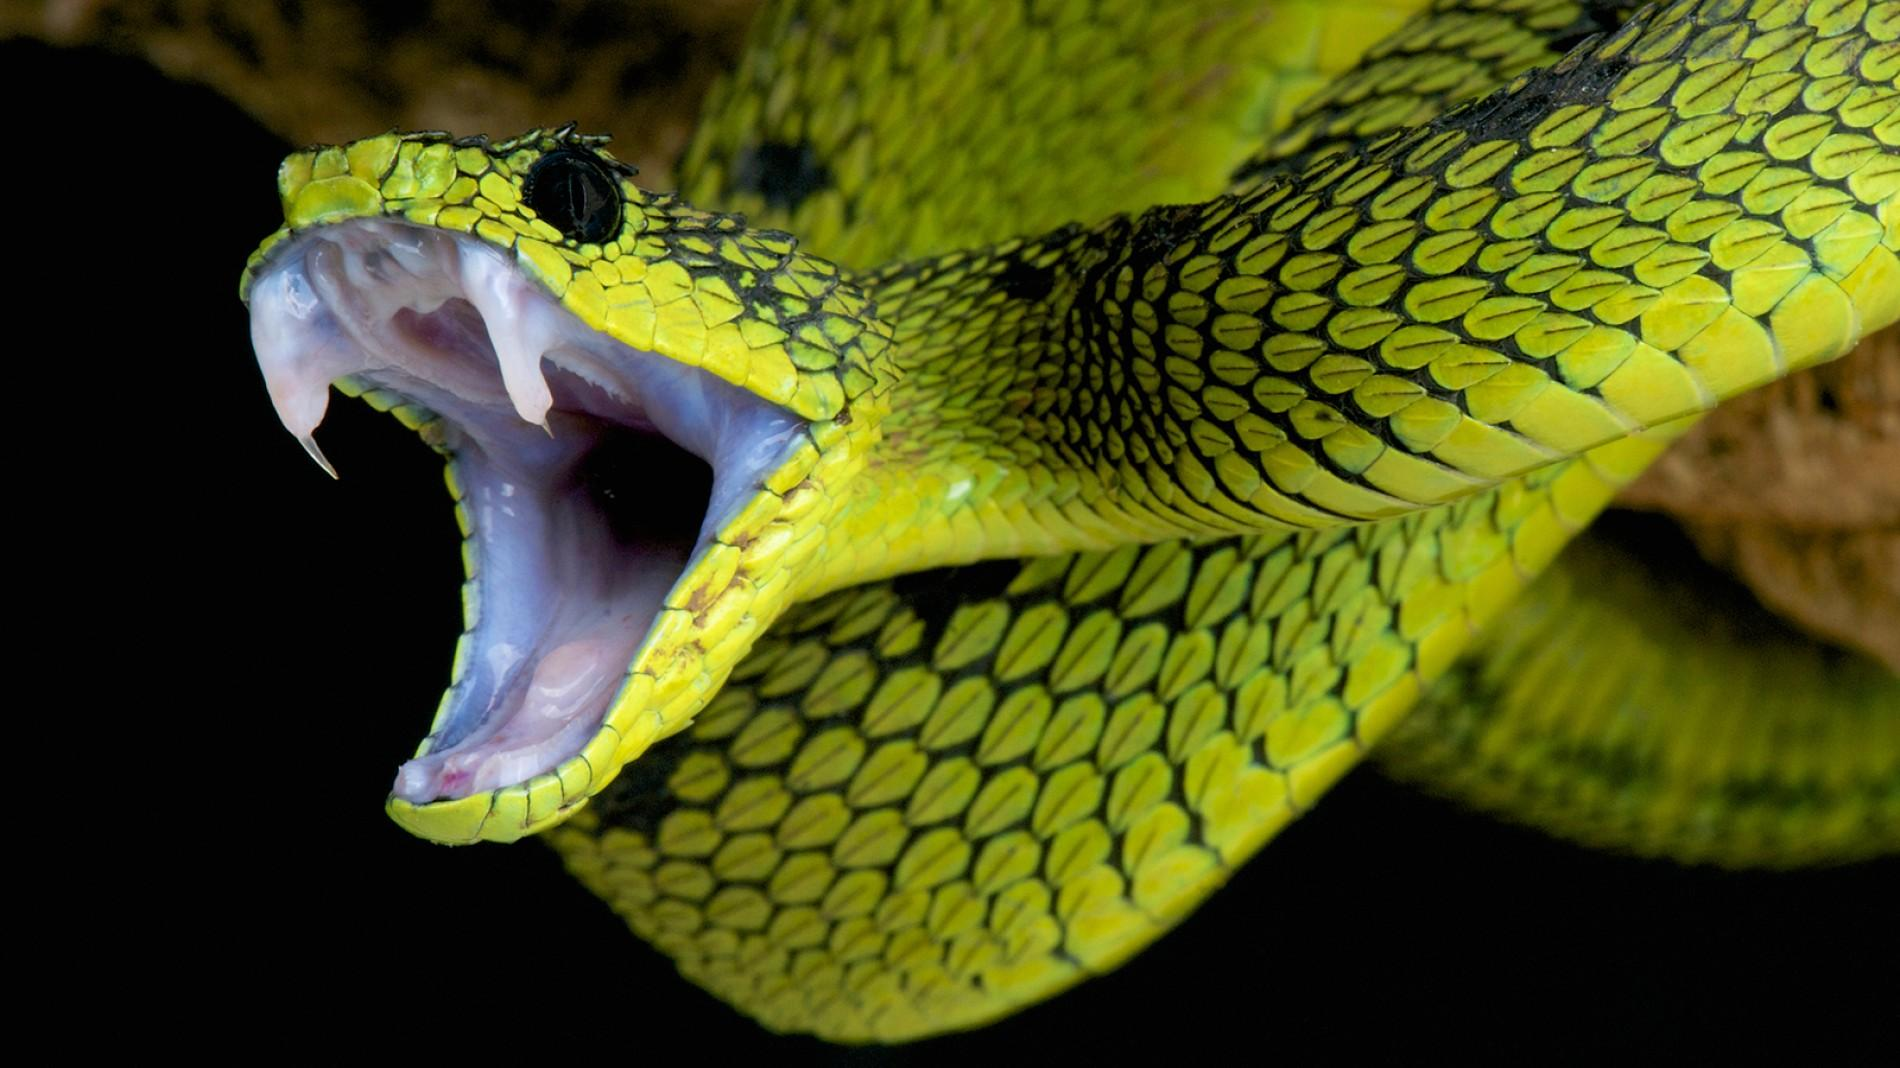 Snake HD wallpapers, Desktop wallpaper - most viewed